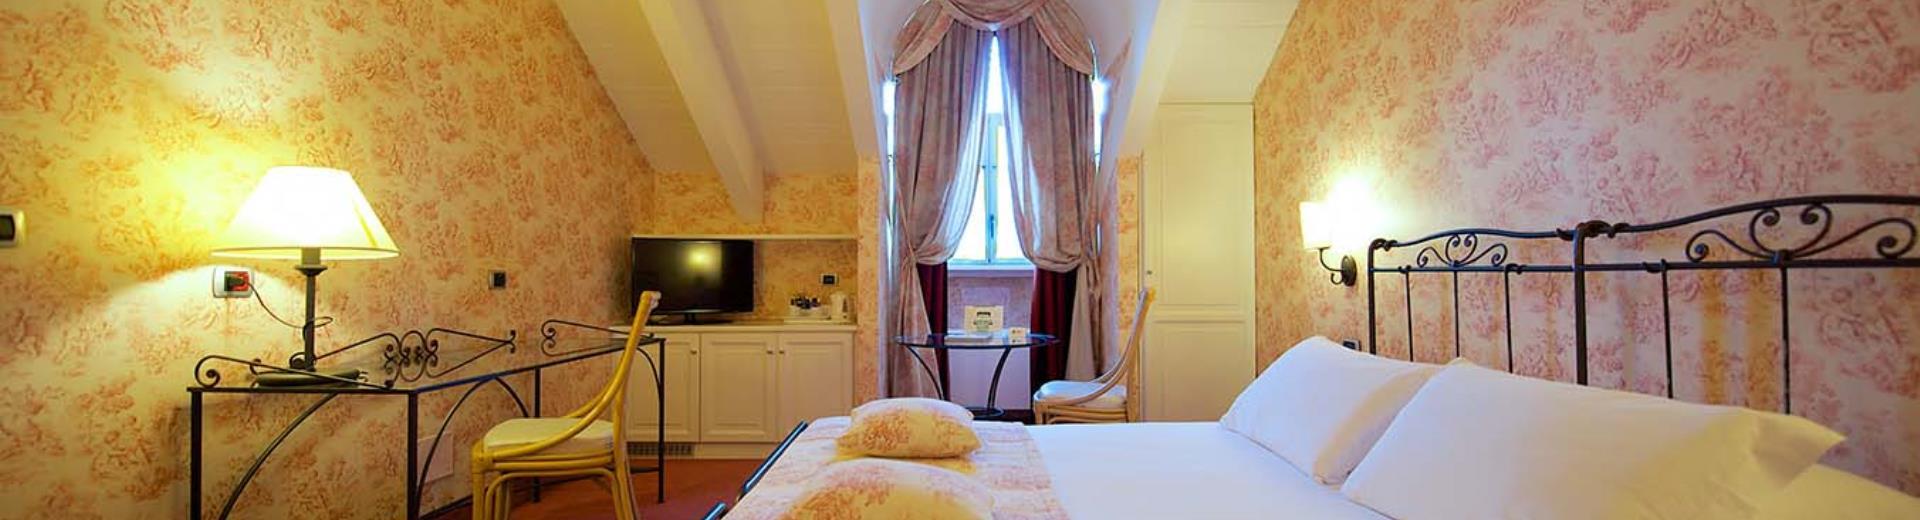 Hotel Torino Porta Nuova Best Western